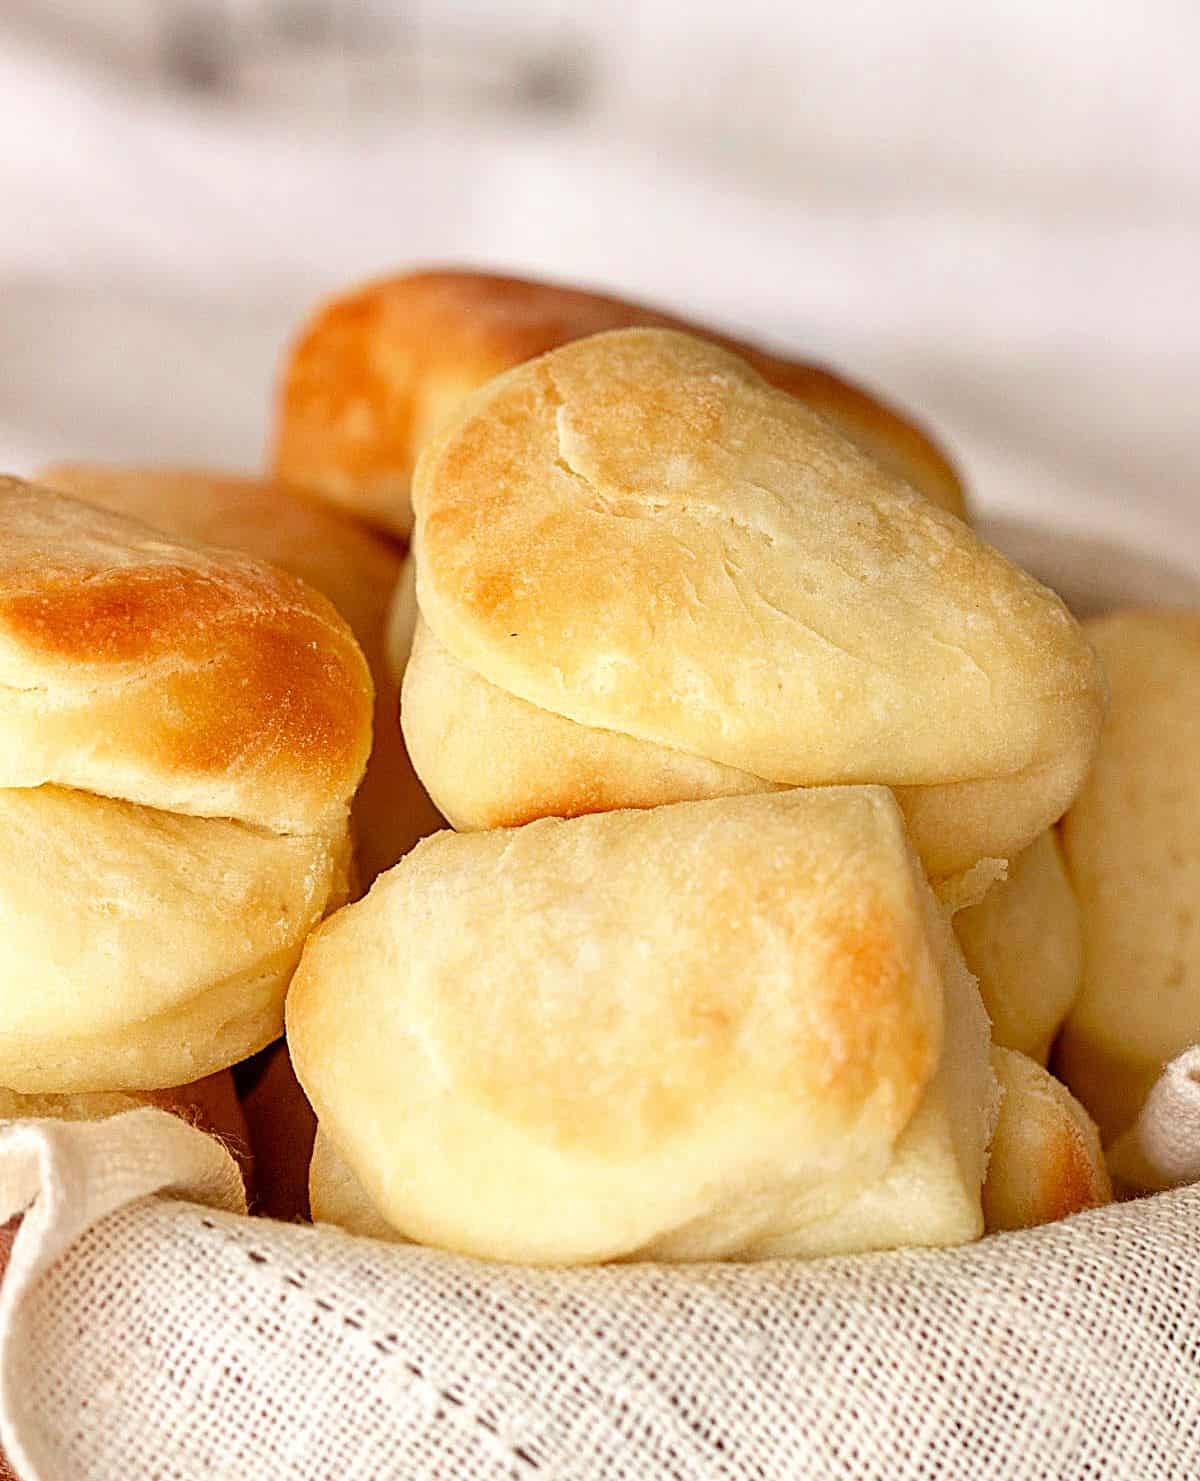 A peak of linen napkin holding mound of golden bread rolls